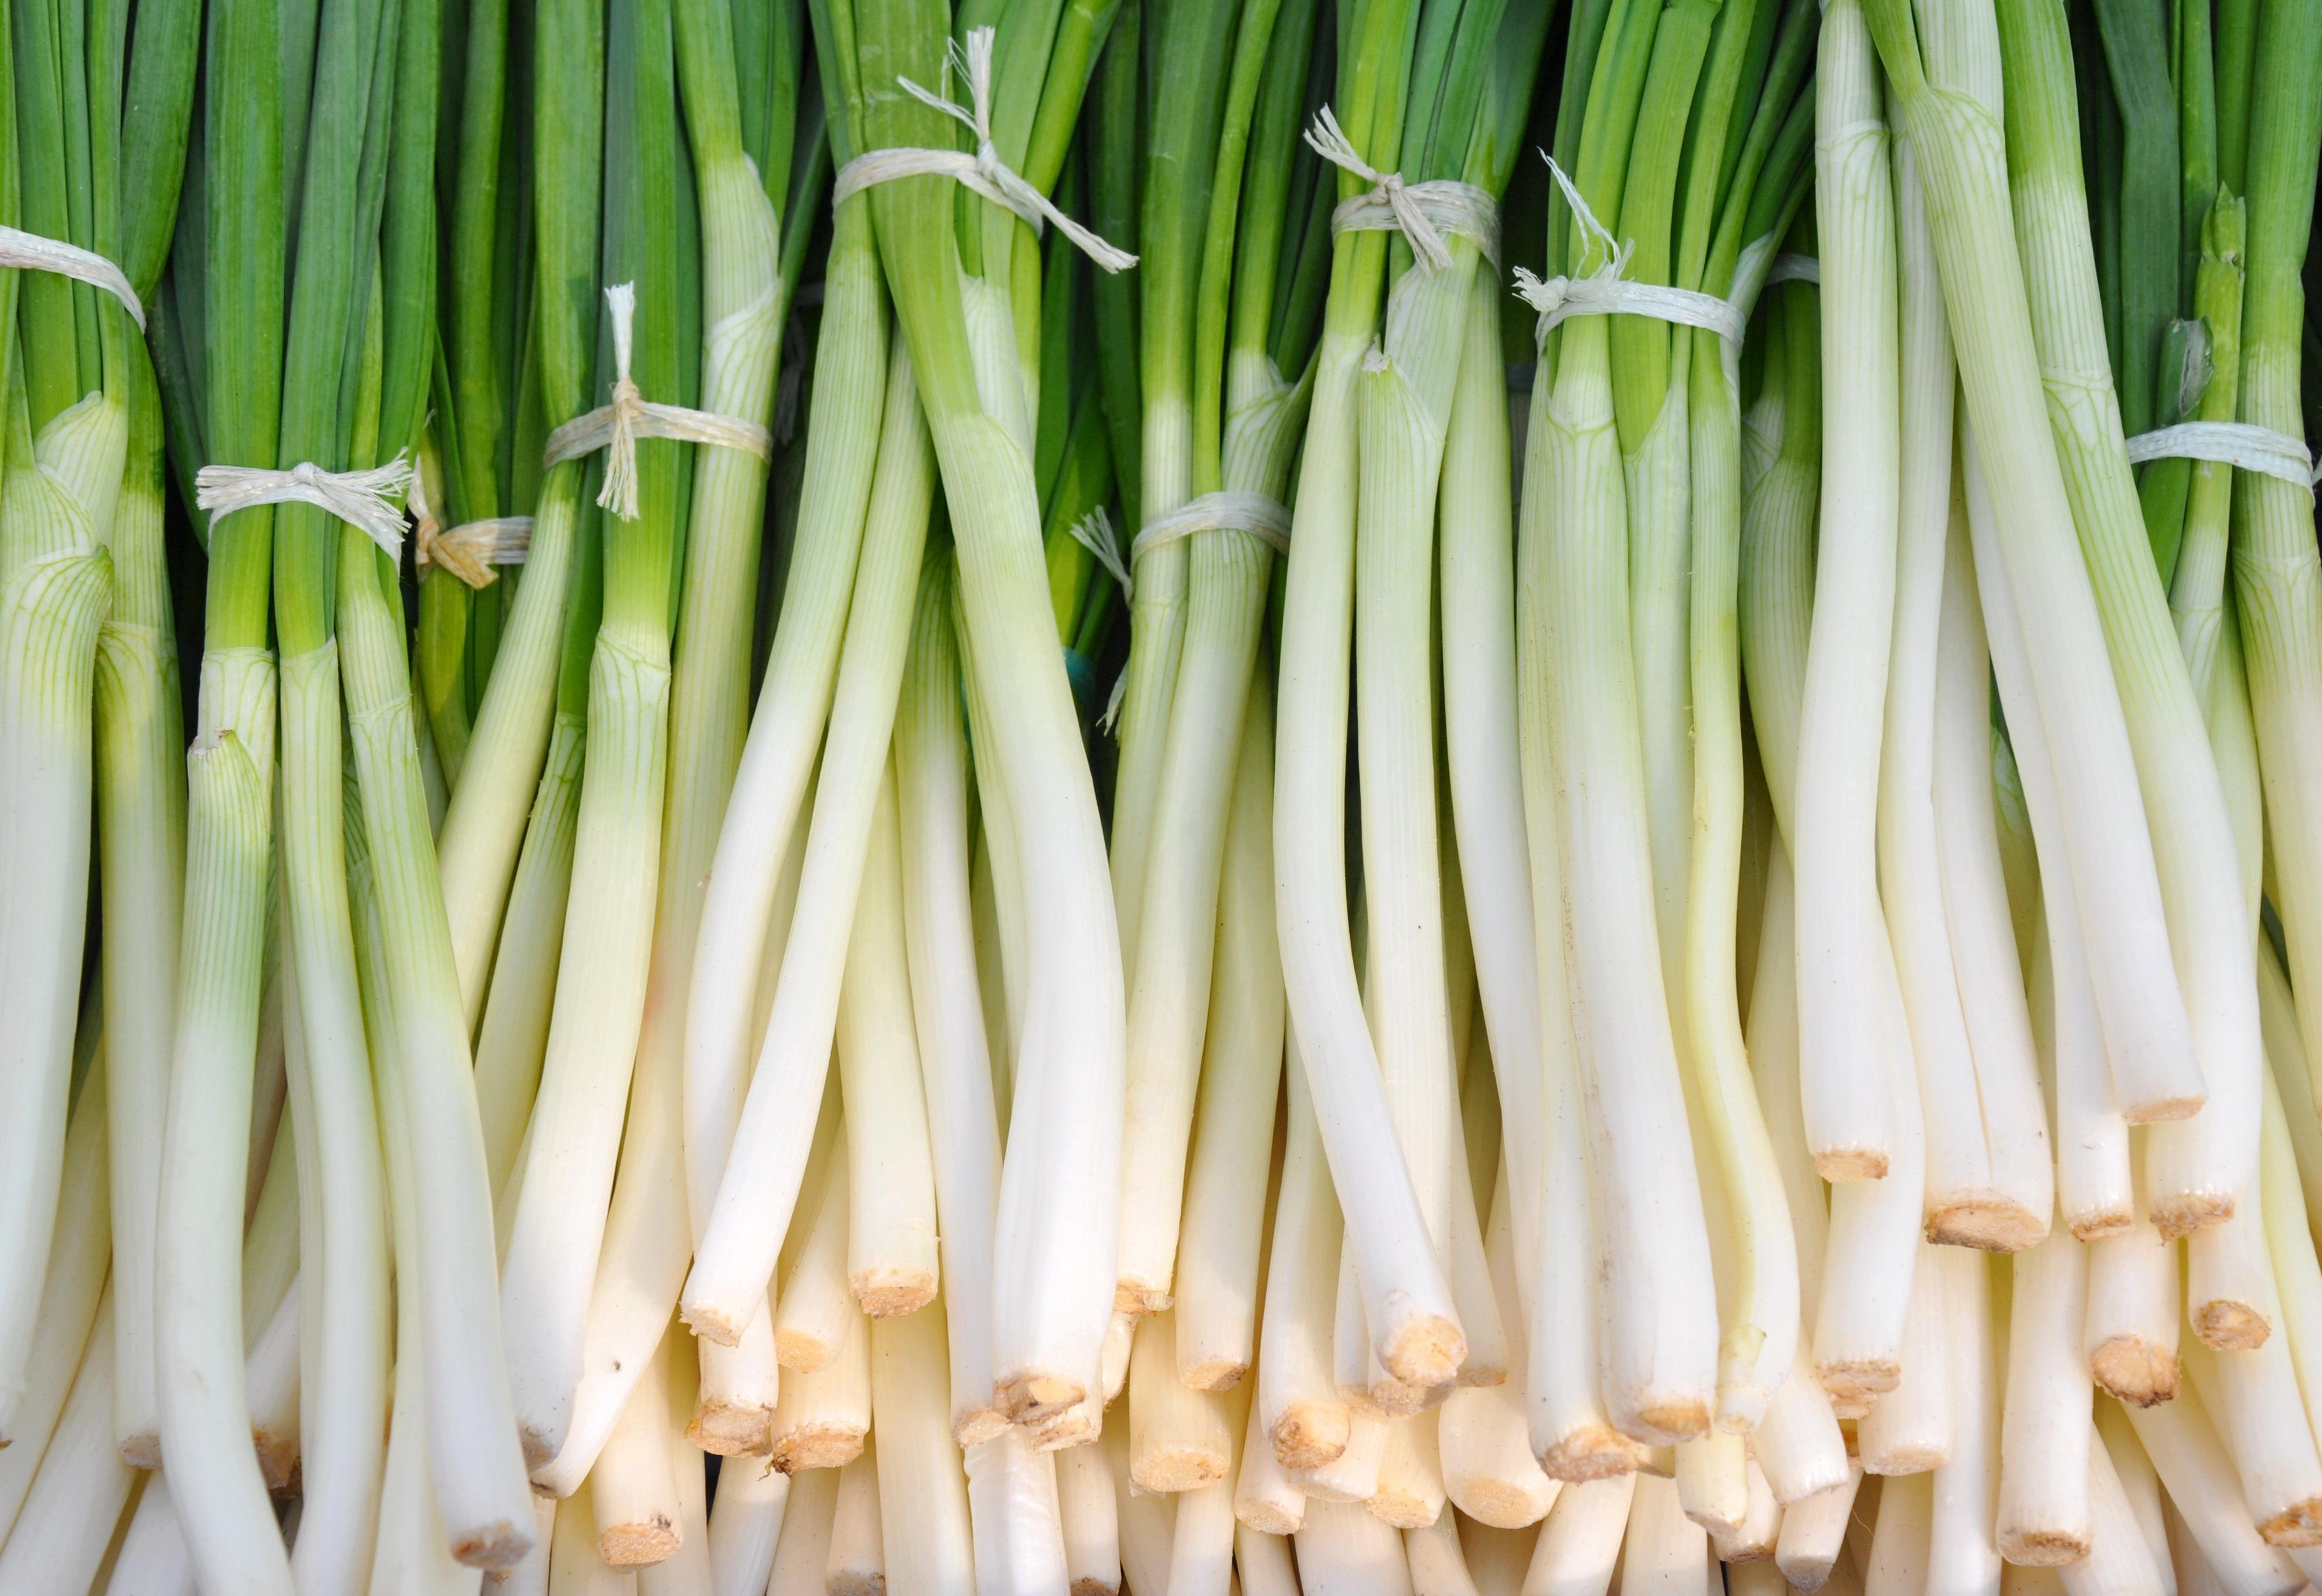 Free Images Food Produce Vegetable Vegetables Leek